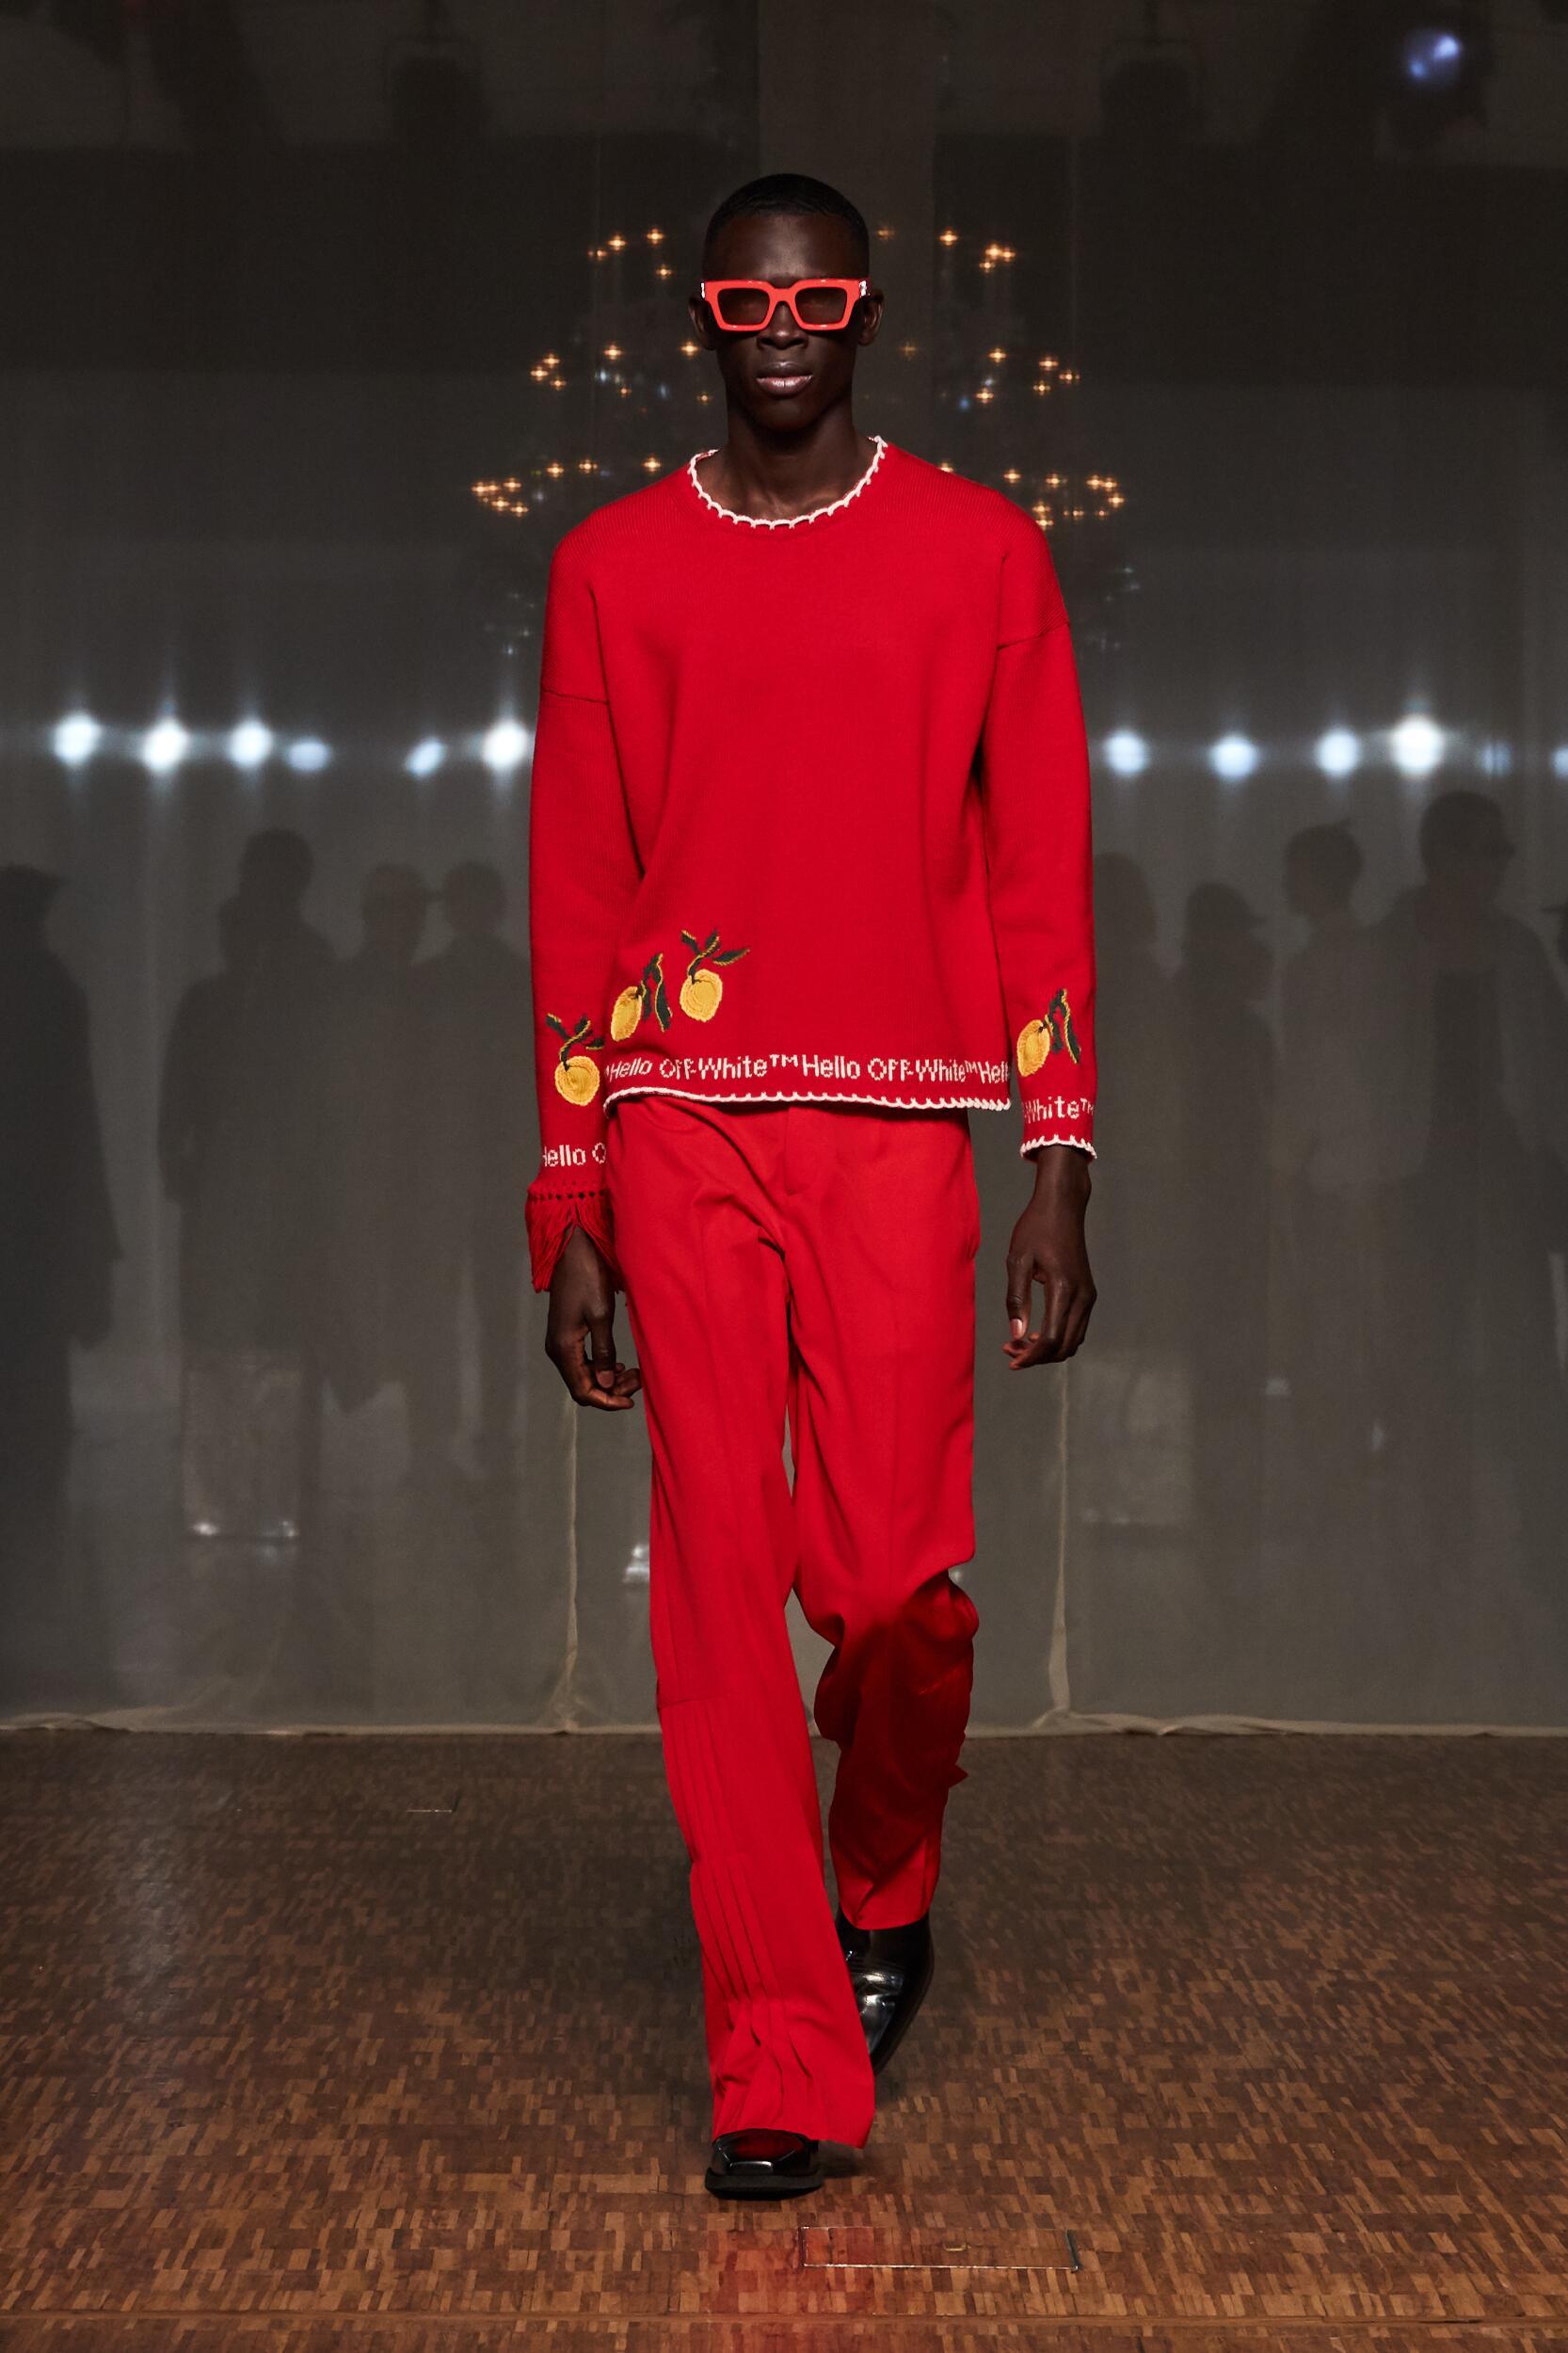 Catwalk Off White c/o Virgil Abloh Man Fashion Show Winter 2020